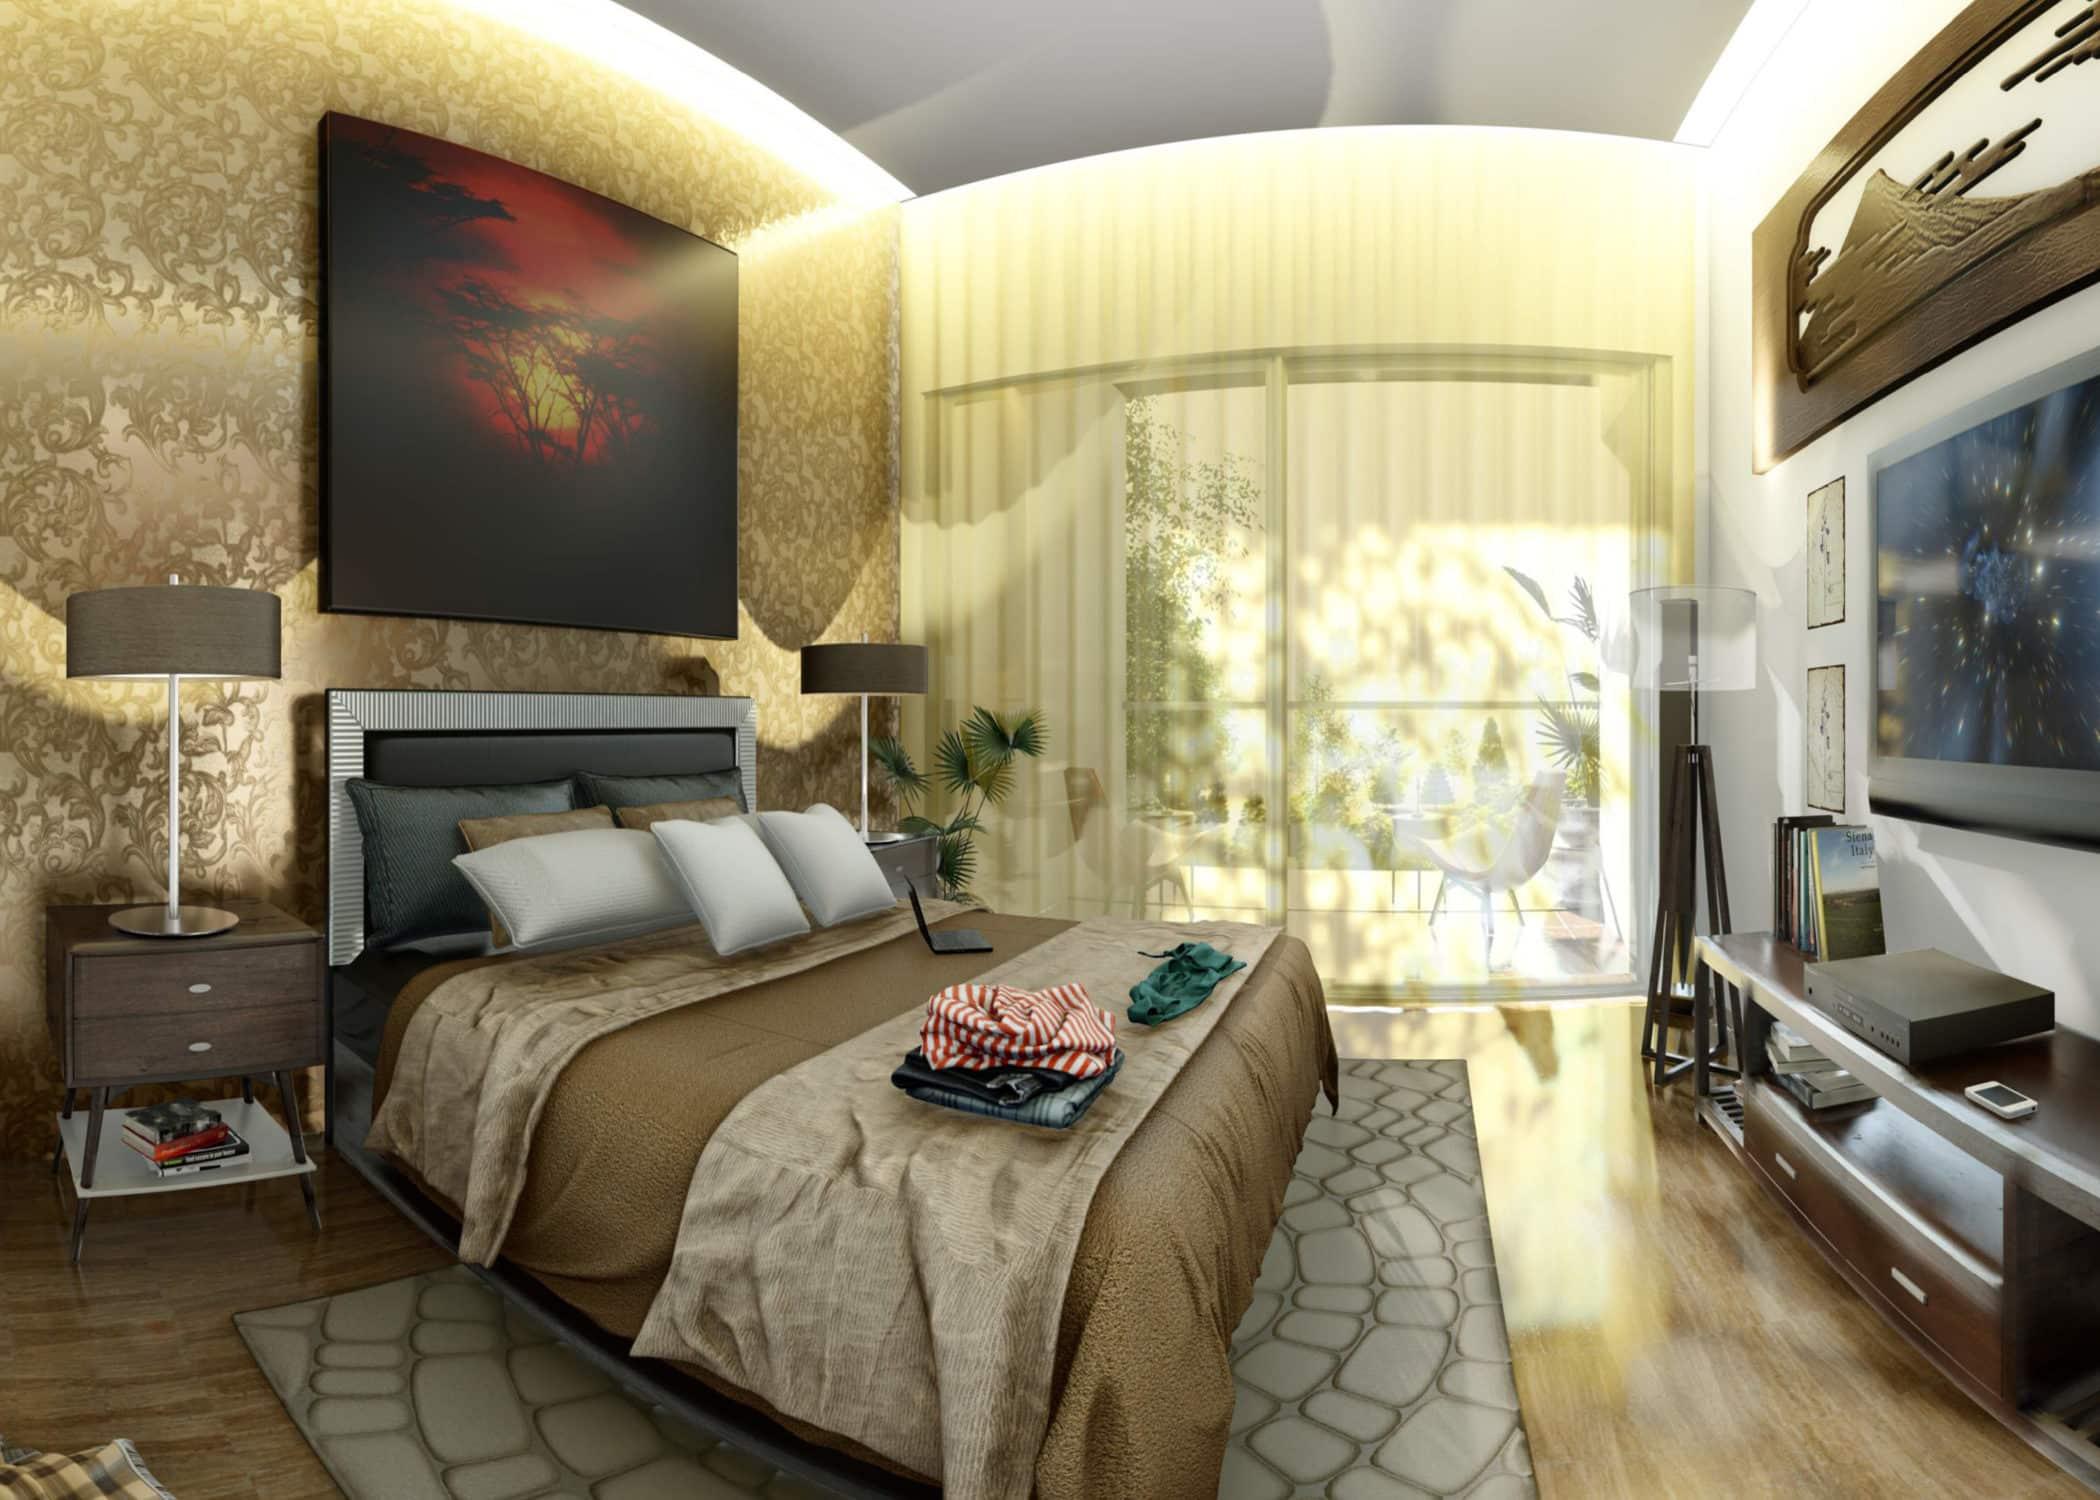 Samana Greens by Samana at Arjan. Luxury apartments for Sale in Dubai_32